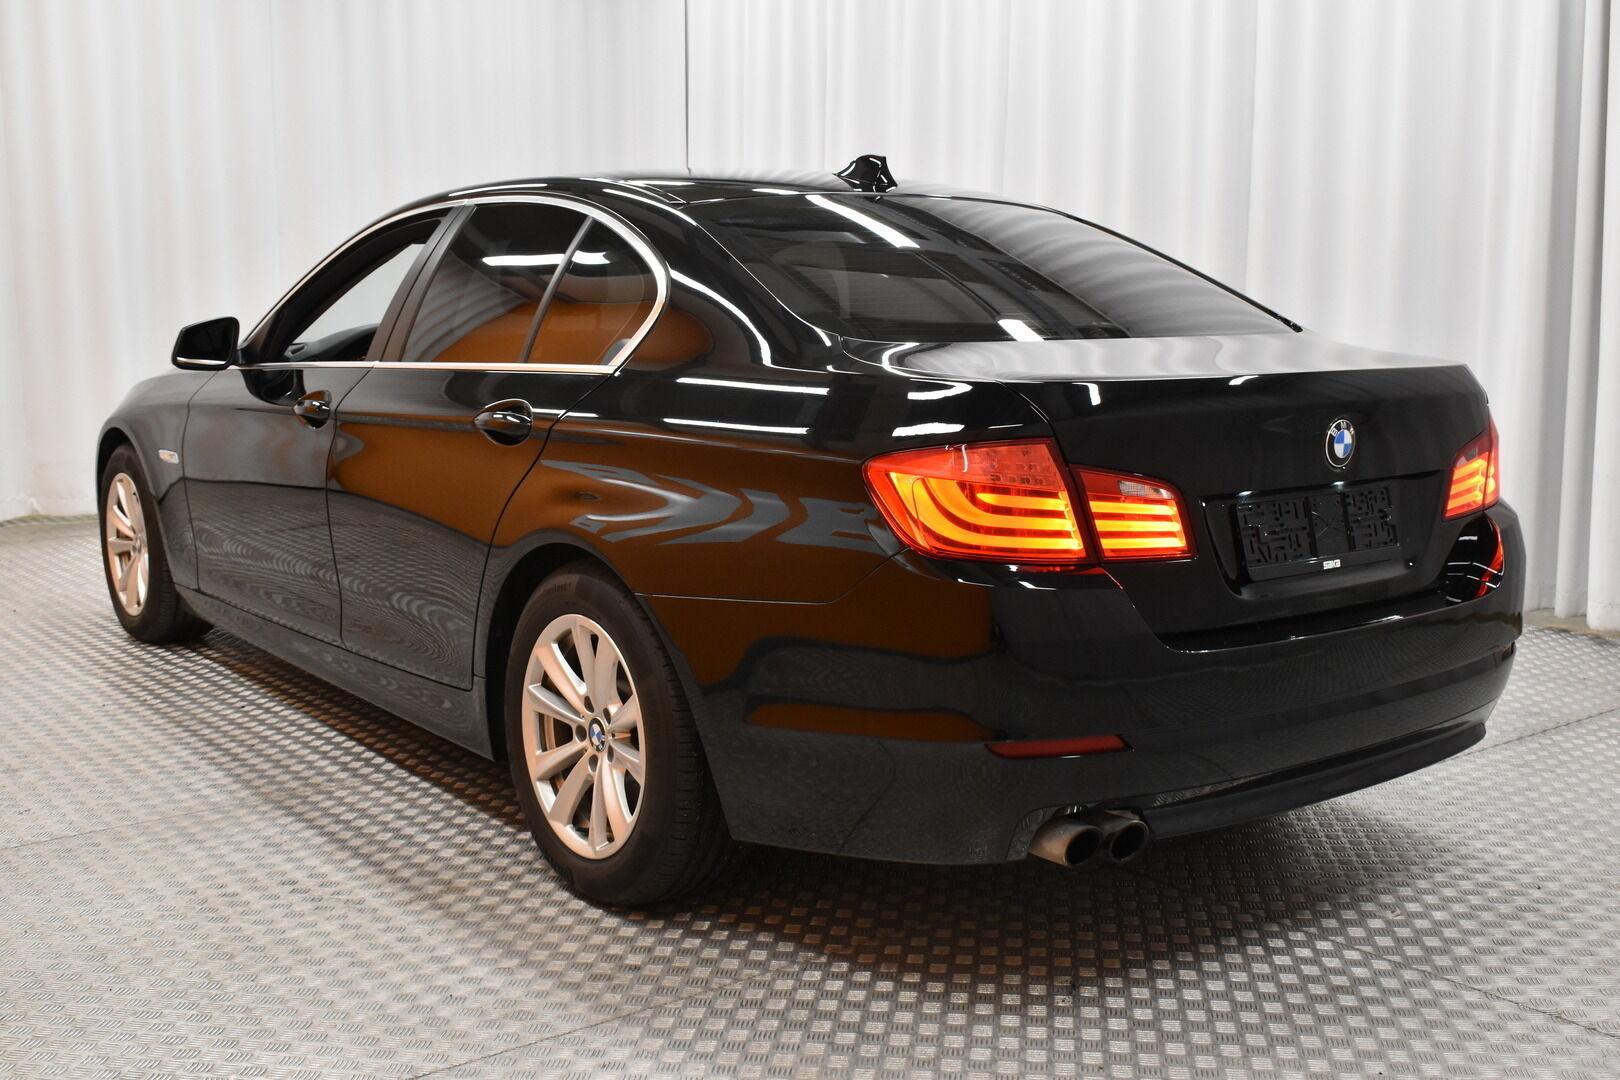 Musta Sedan, BMW 528 – POR-8128, kuva 5